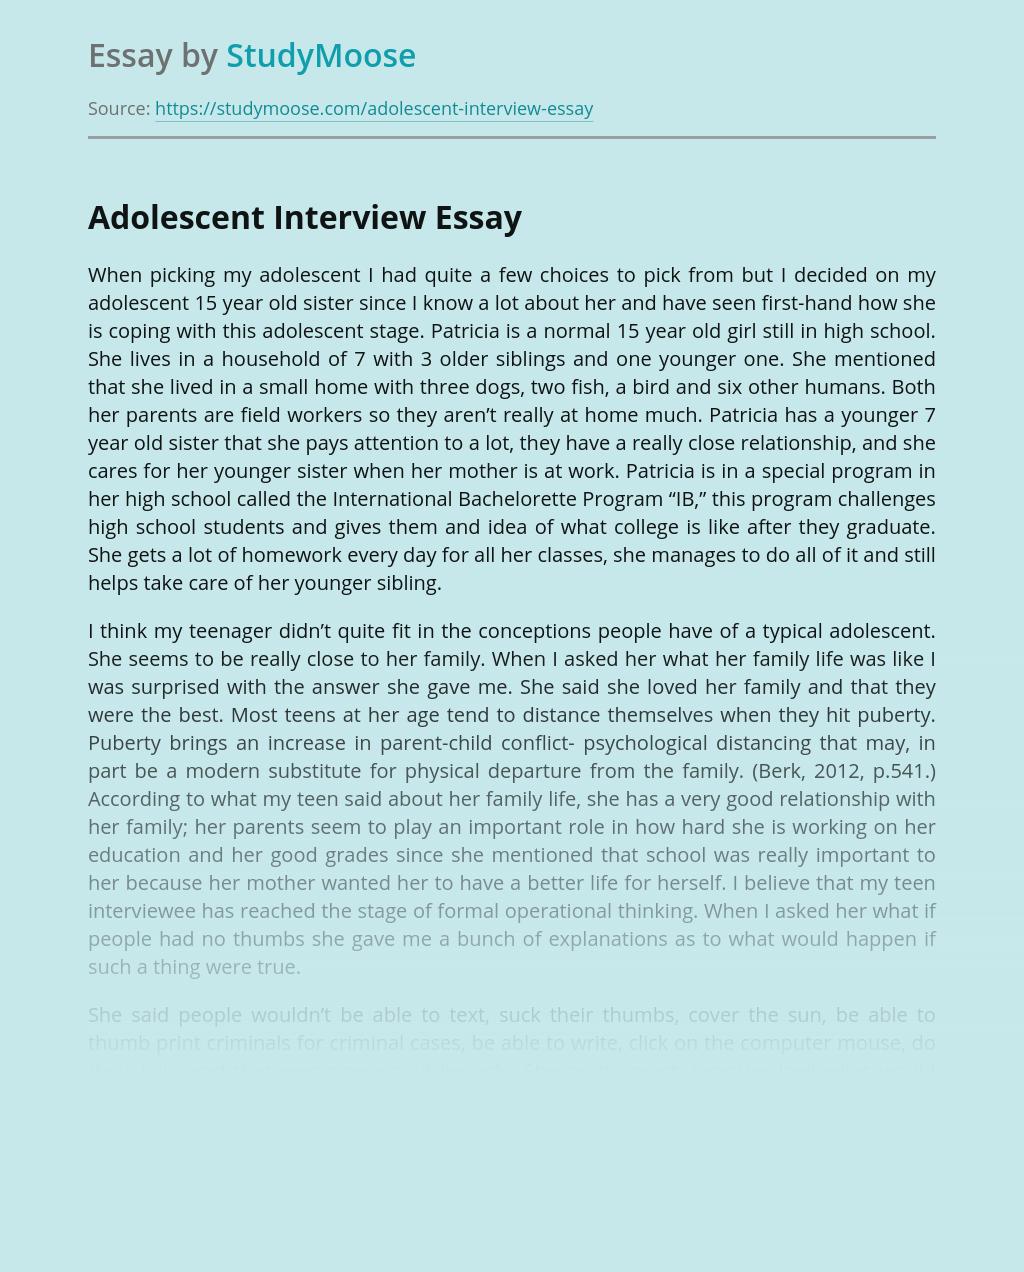 Adolescent Interview